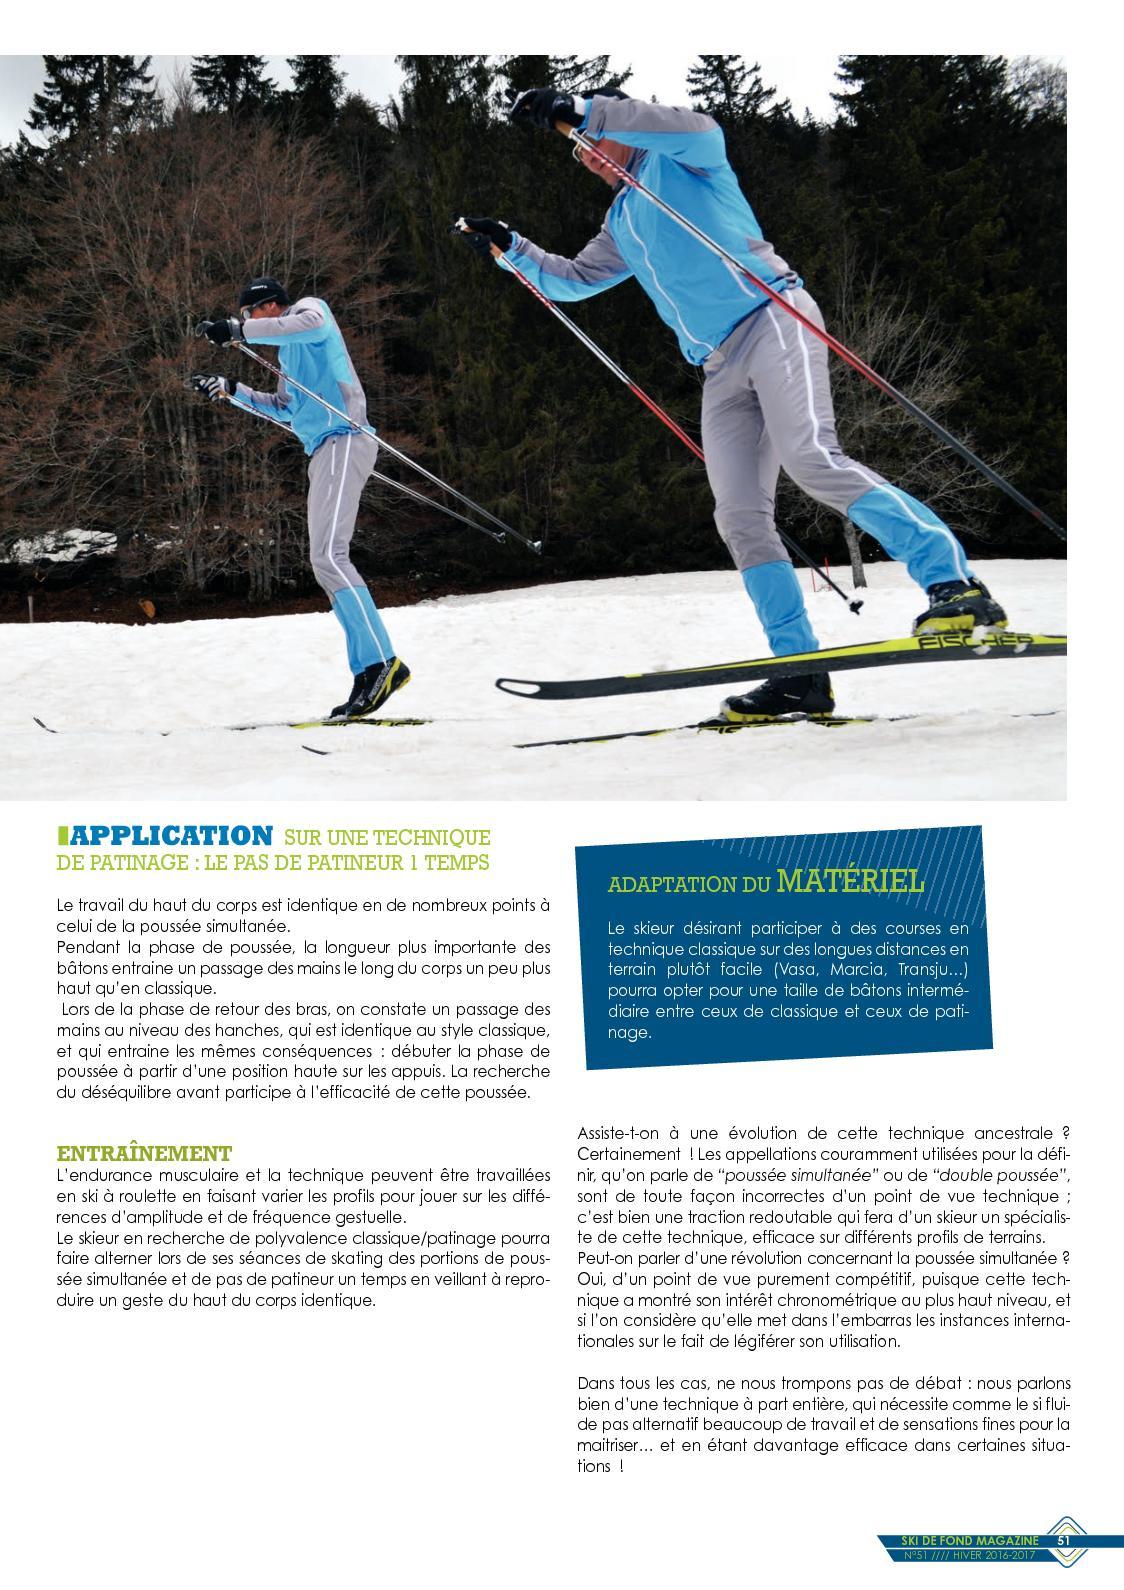 Technique Ski De Fond Skating : technique, skating, Revue, N°51, CALAMEO, Downloader